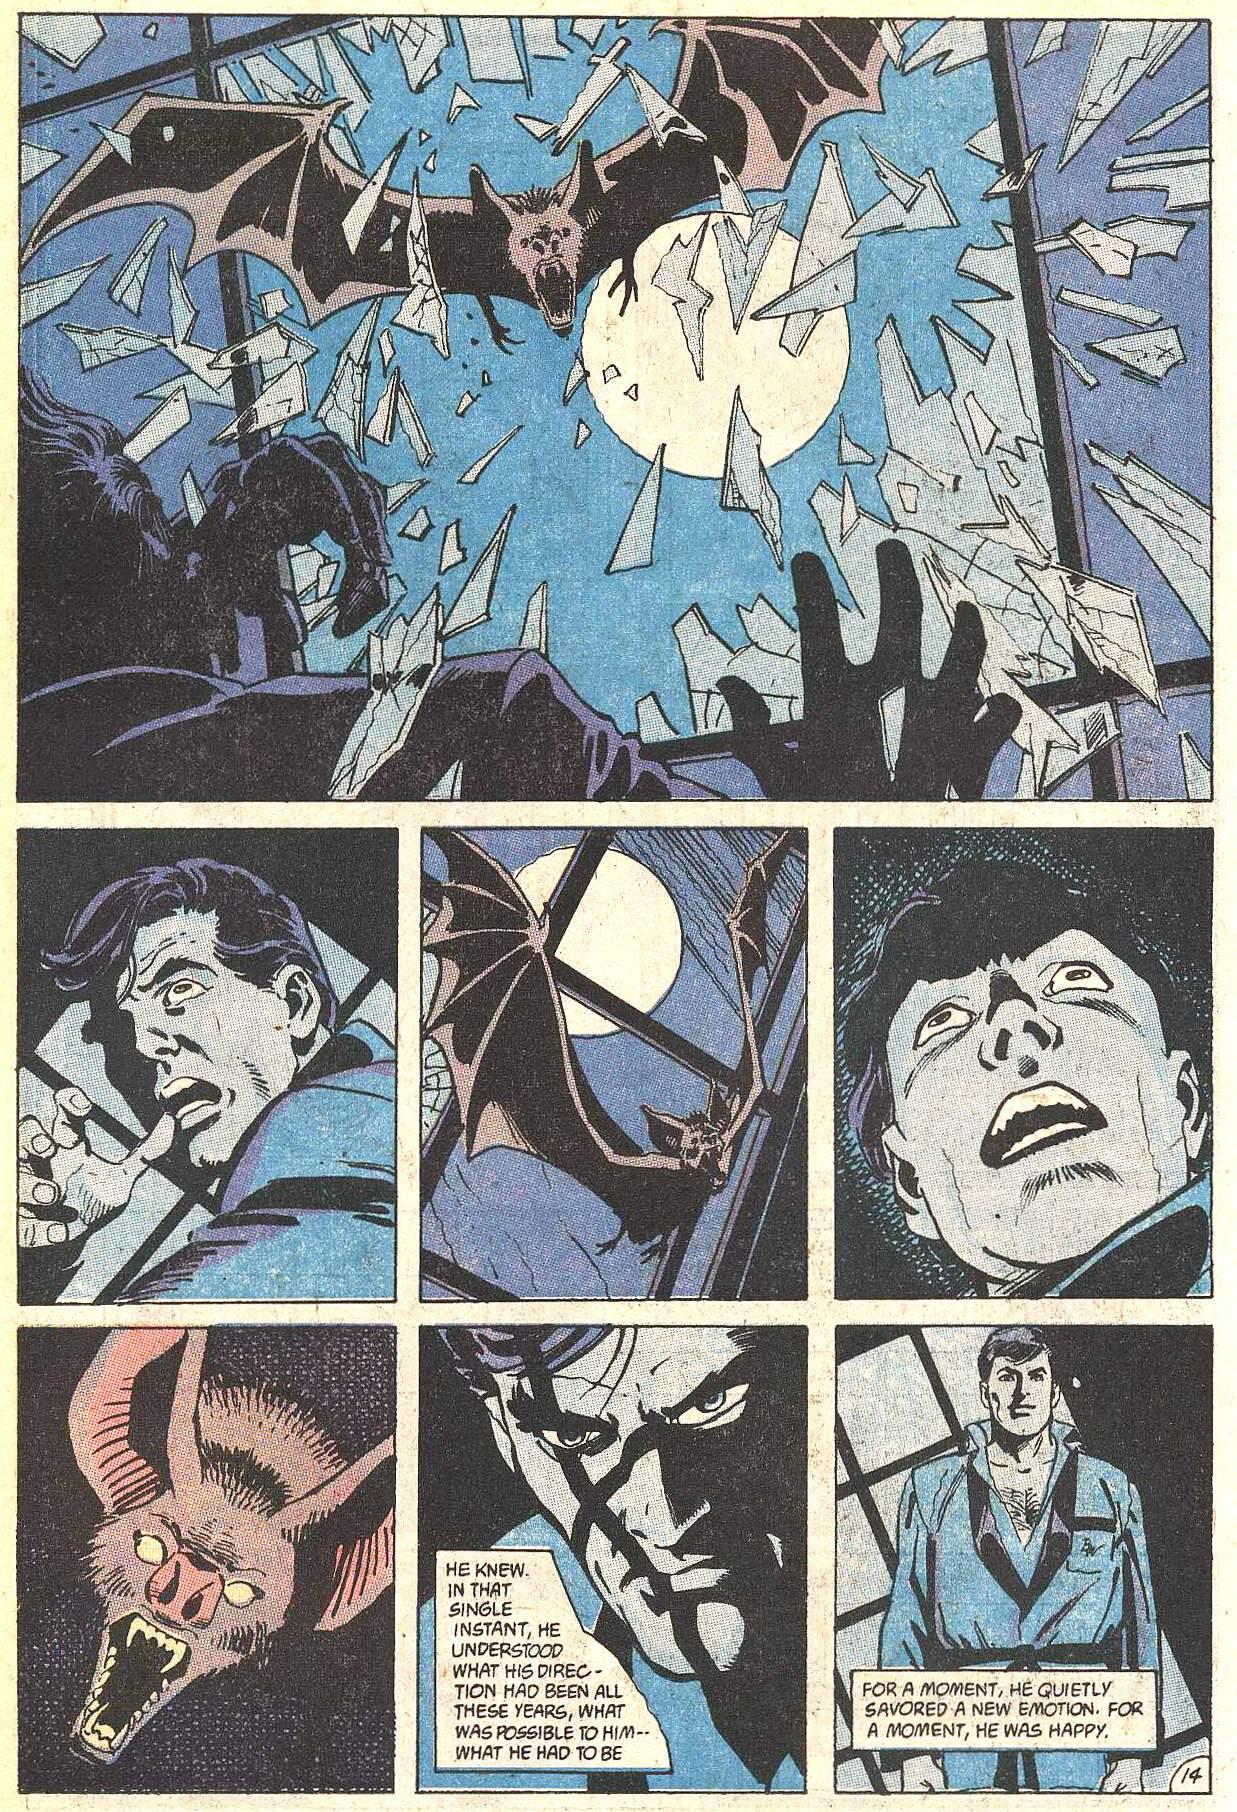 Psychology of Bruce Wayne RCO021